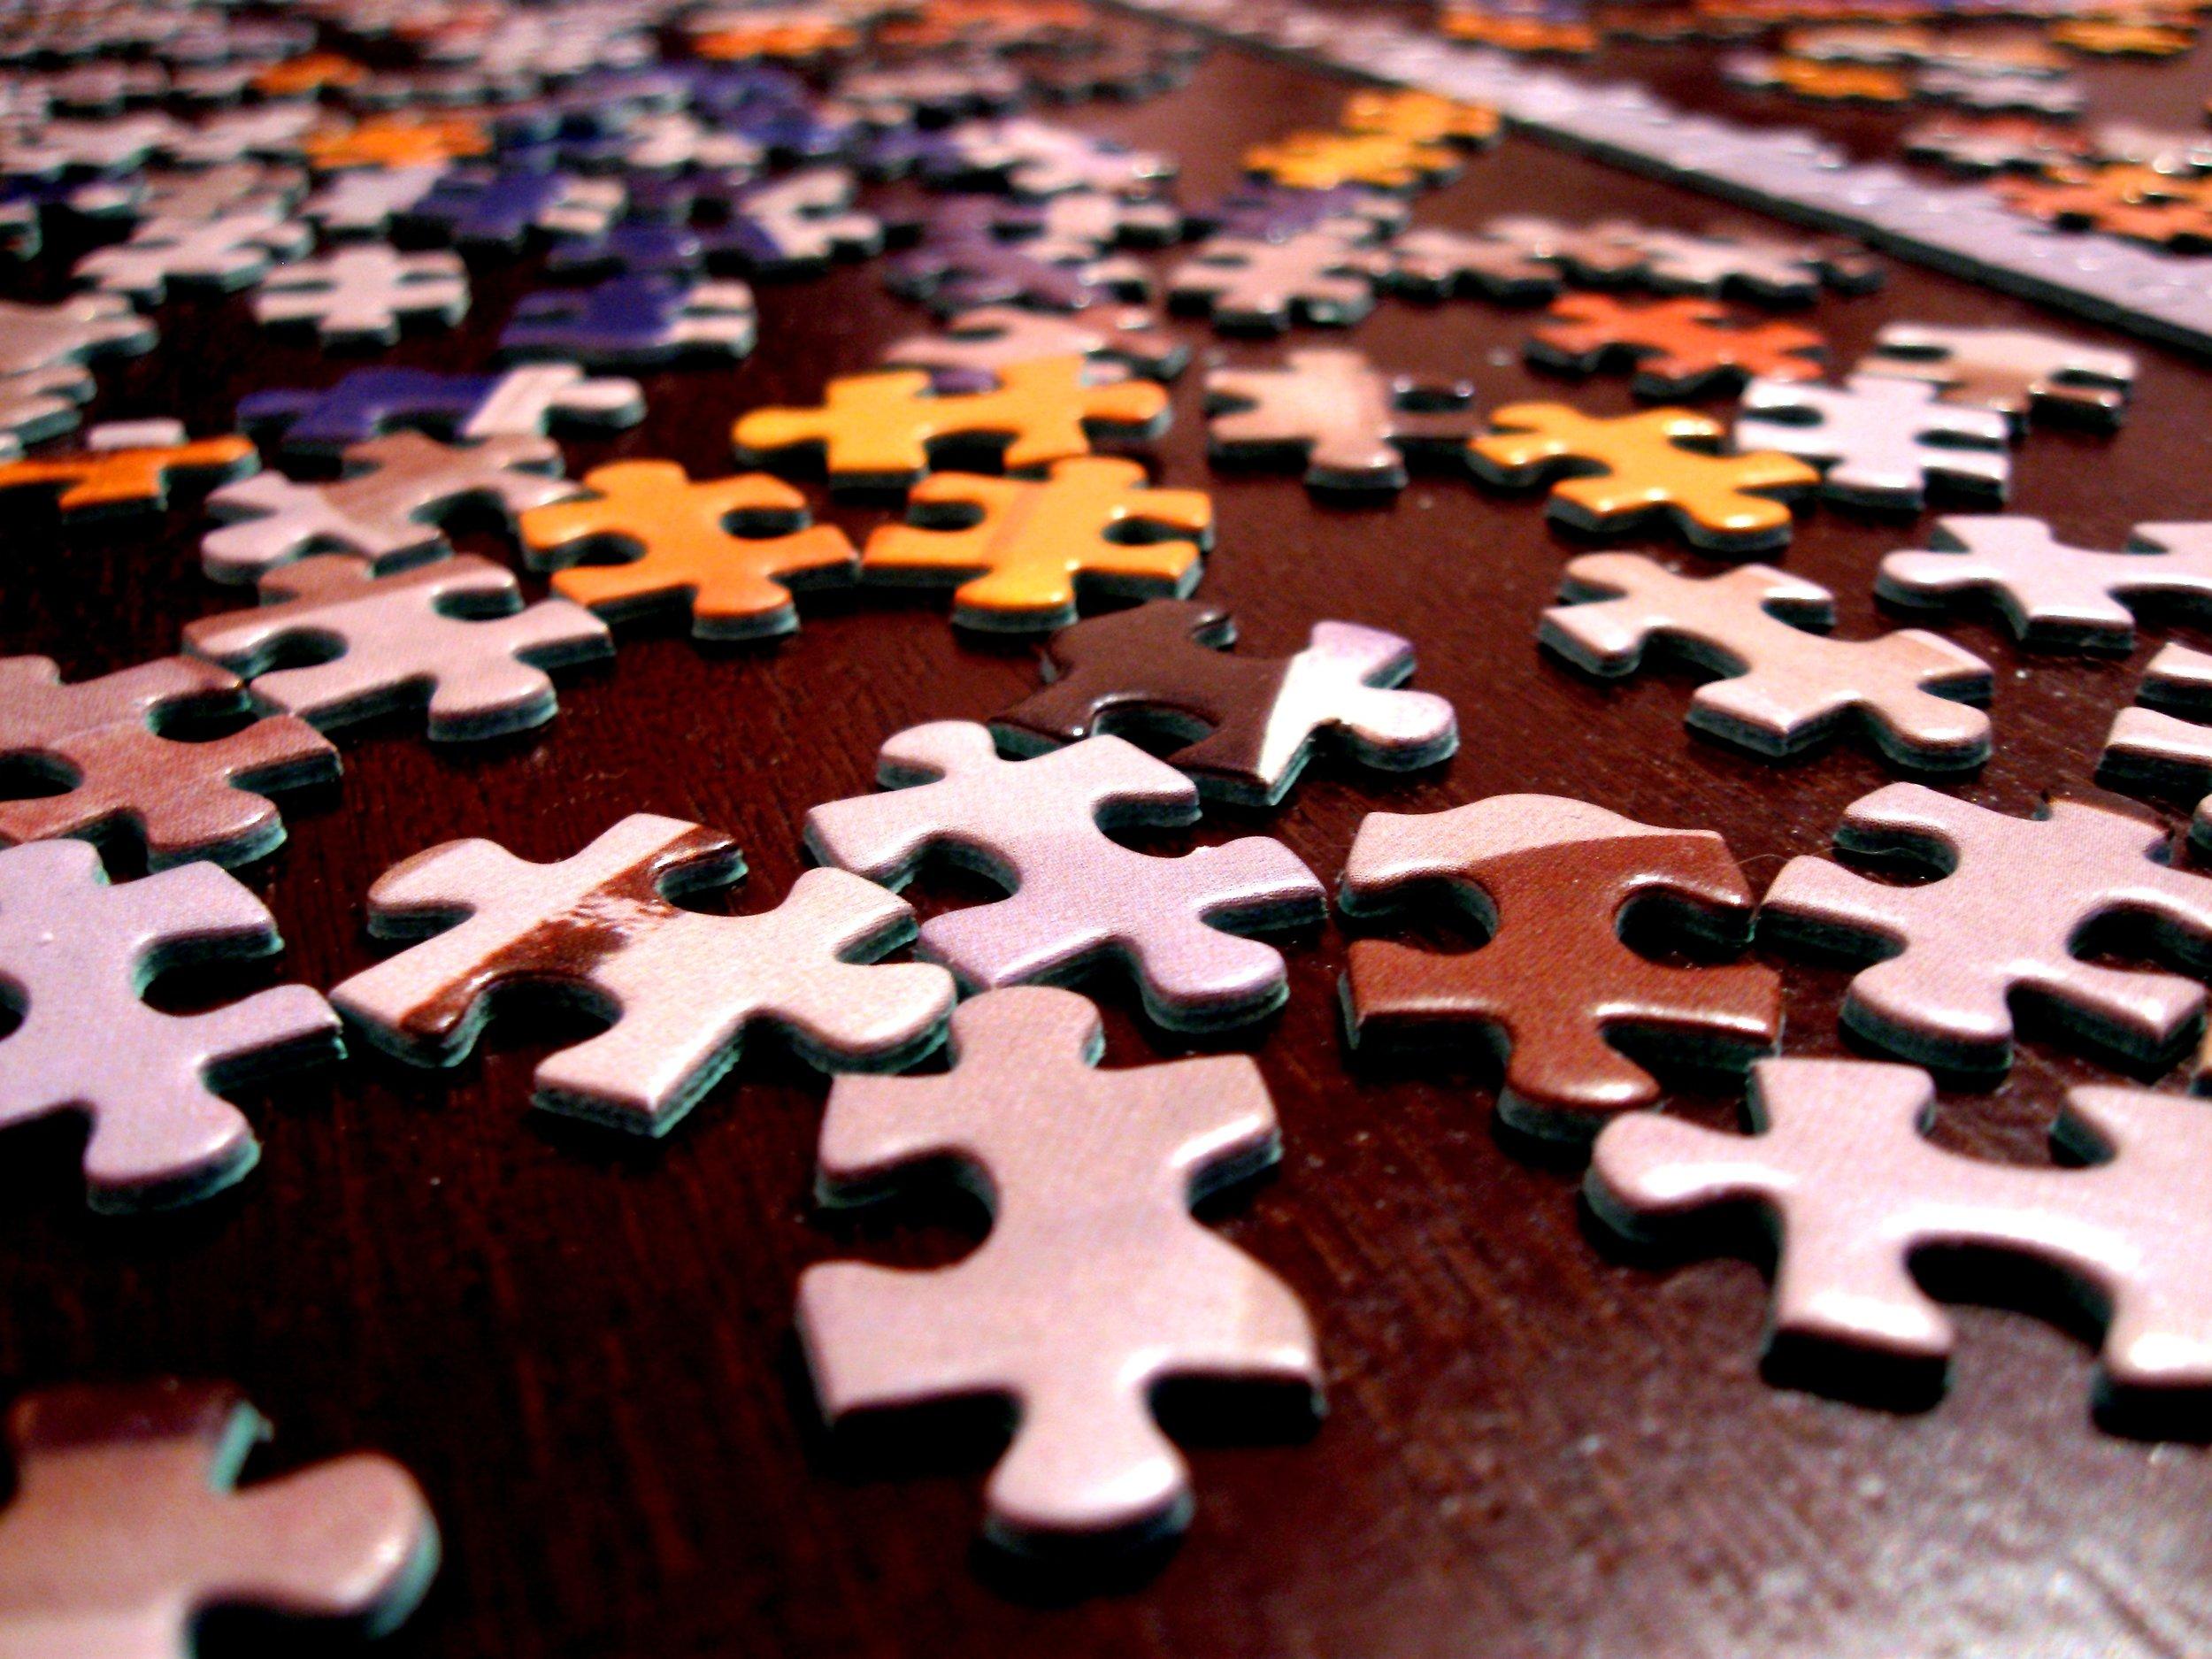 jigsaw puzzle piles.jpg